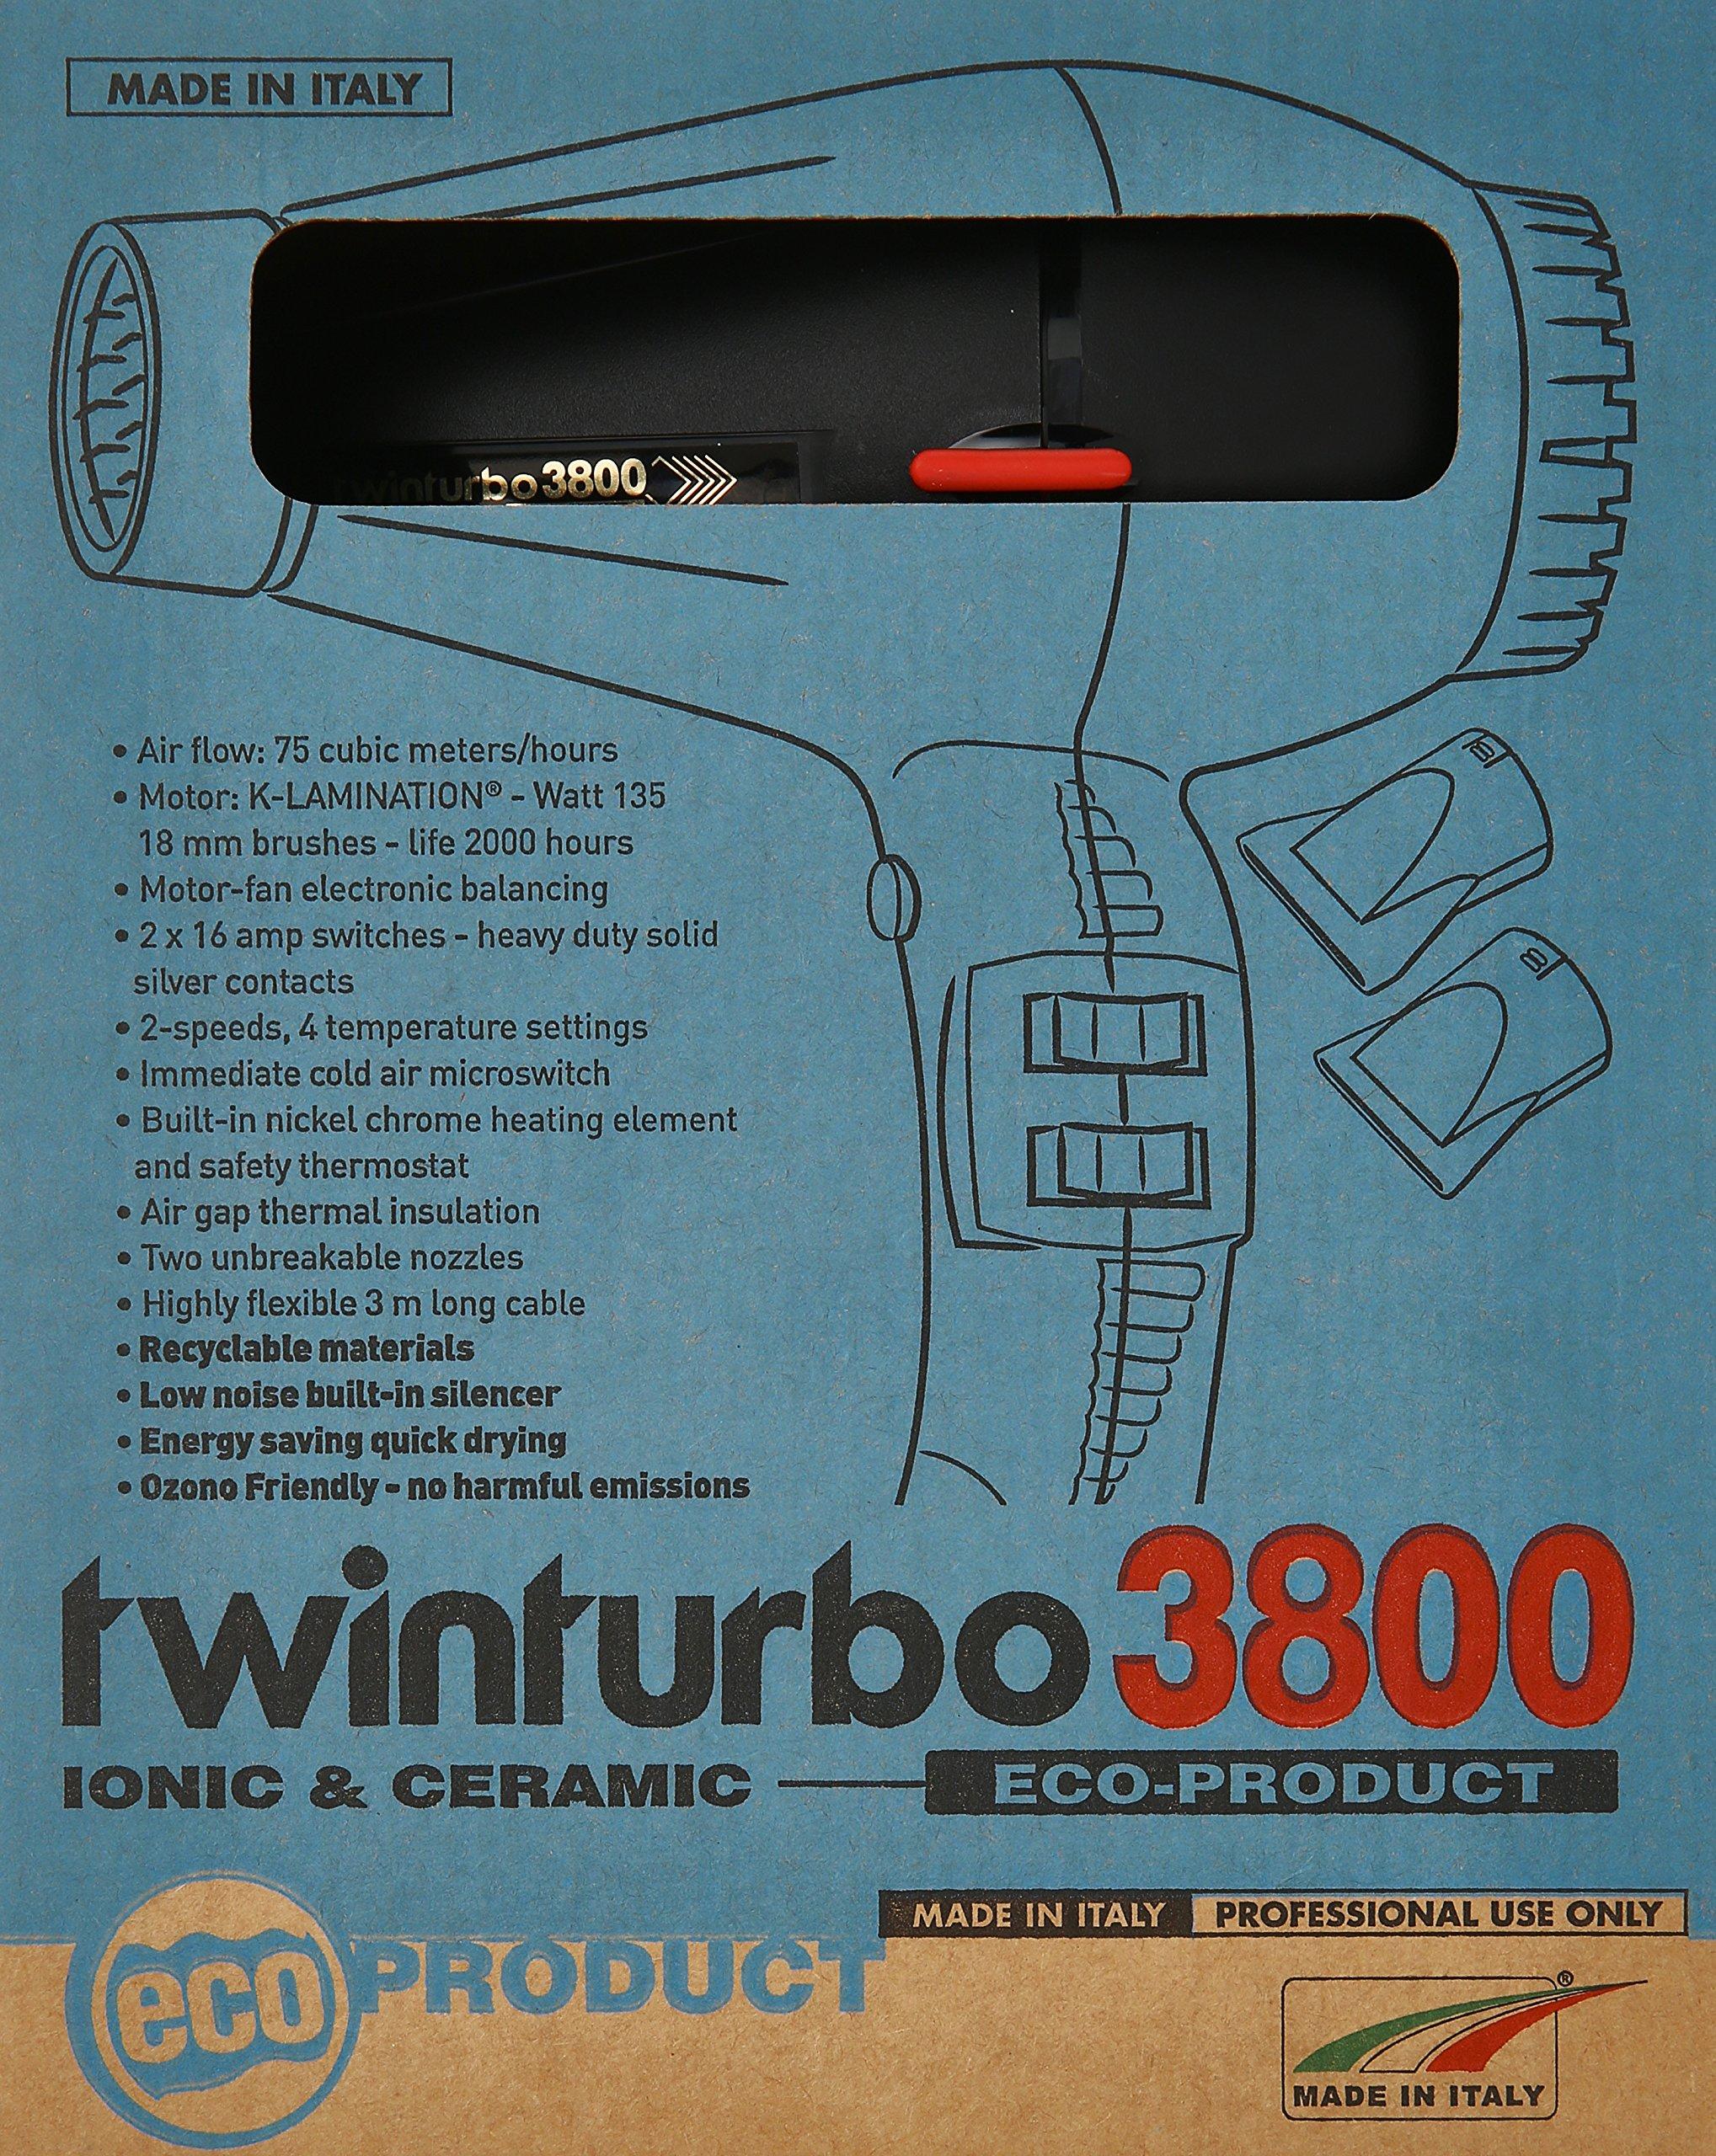 Pibbs TTEC8012 Twin Turbo 3800 Professional Ionic and Ceramic Hair Dryer, Black, 2100 Watt